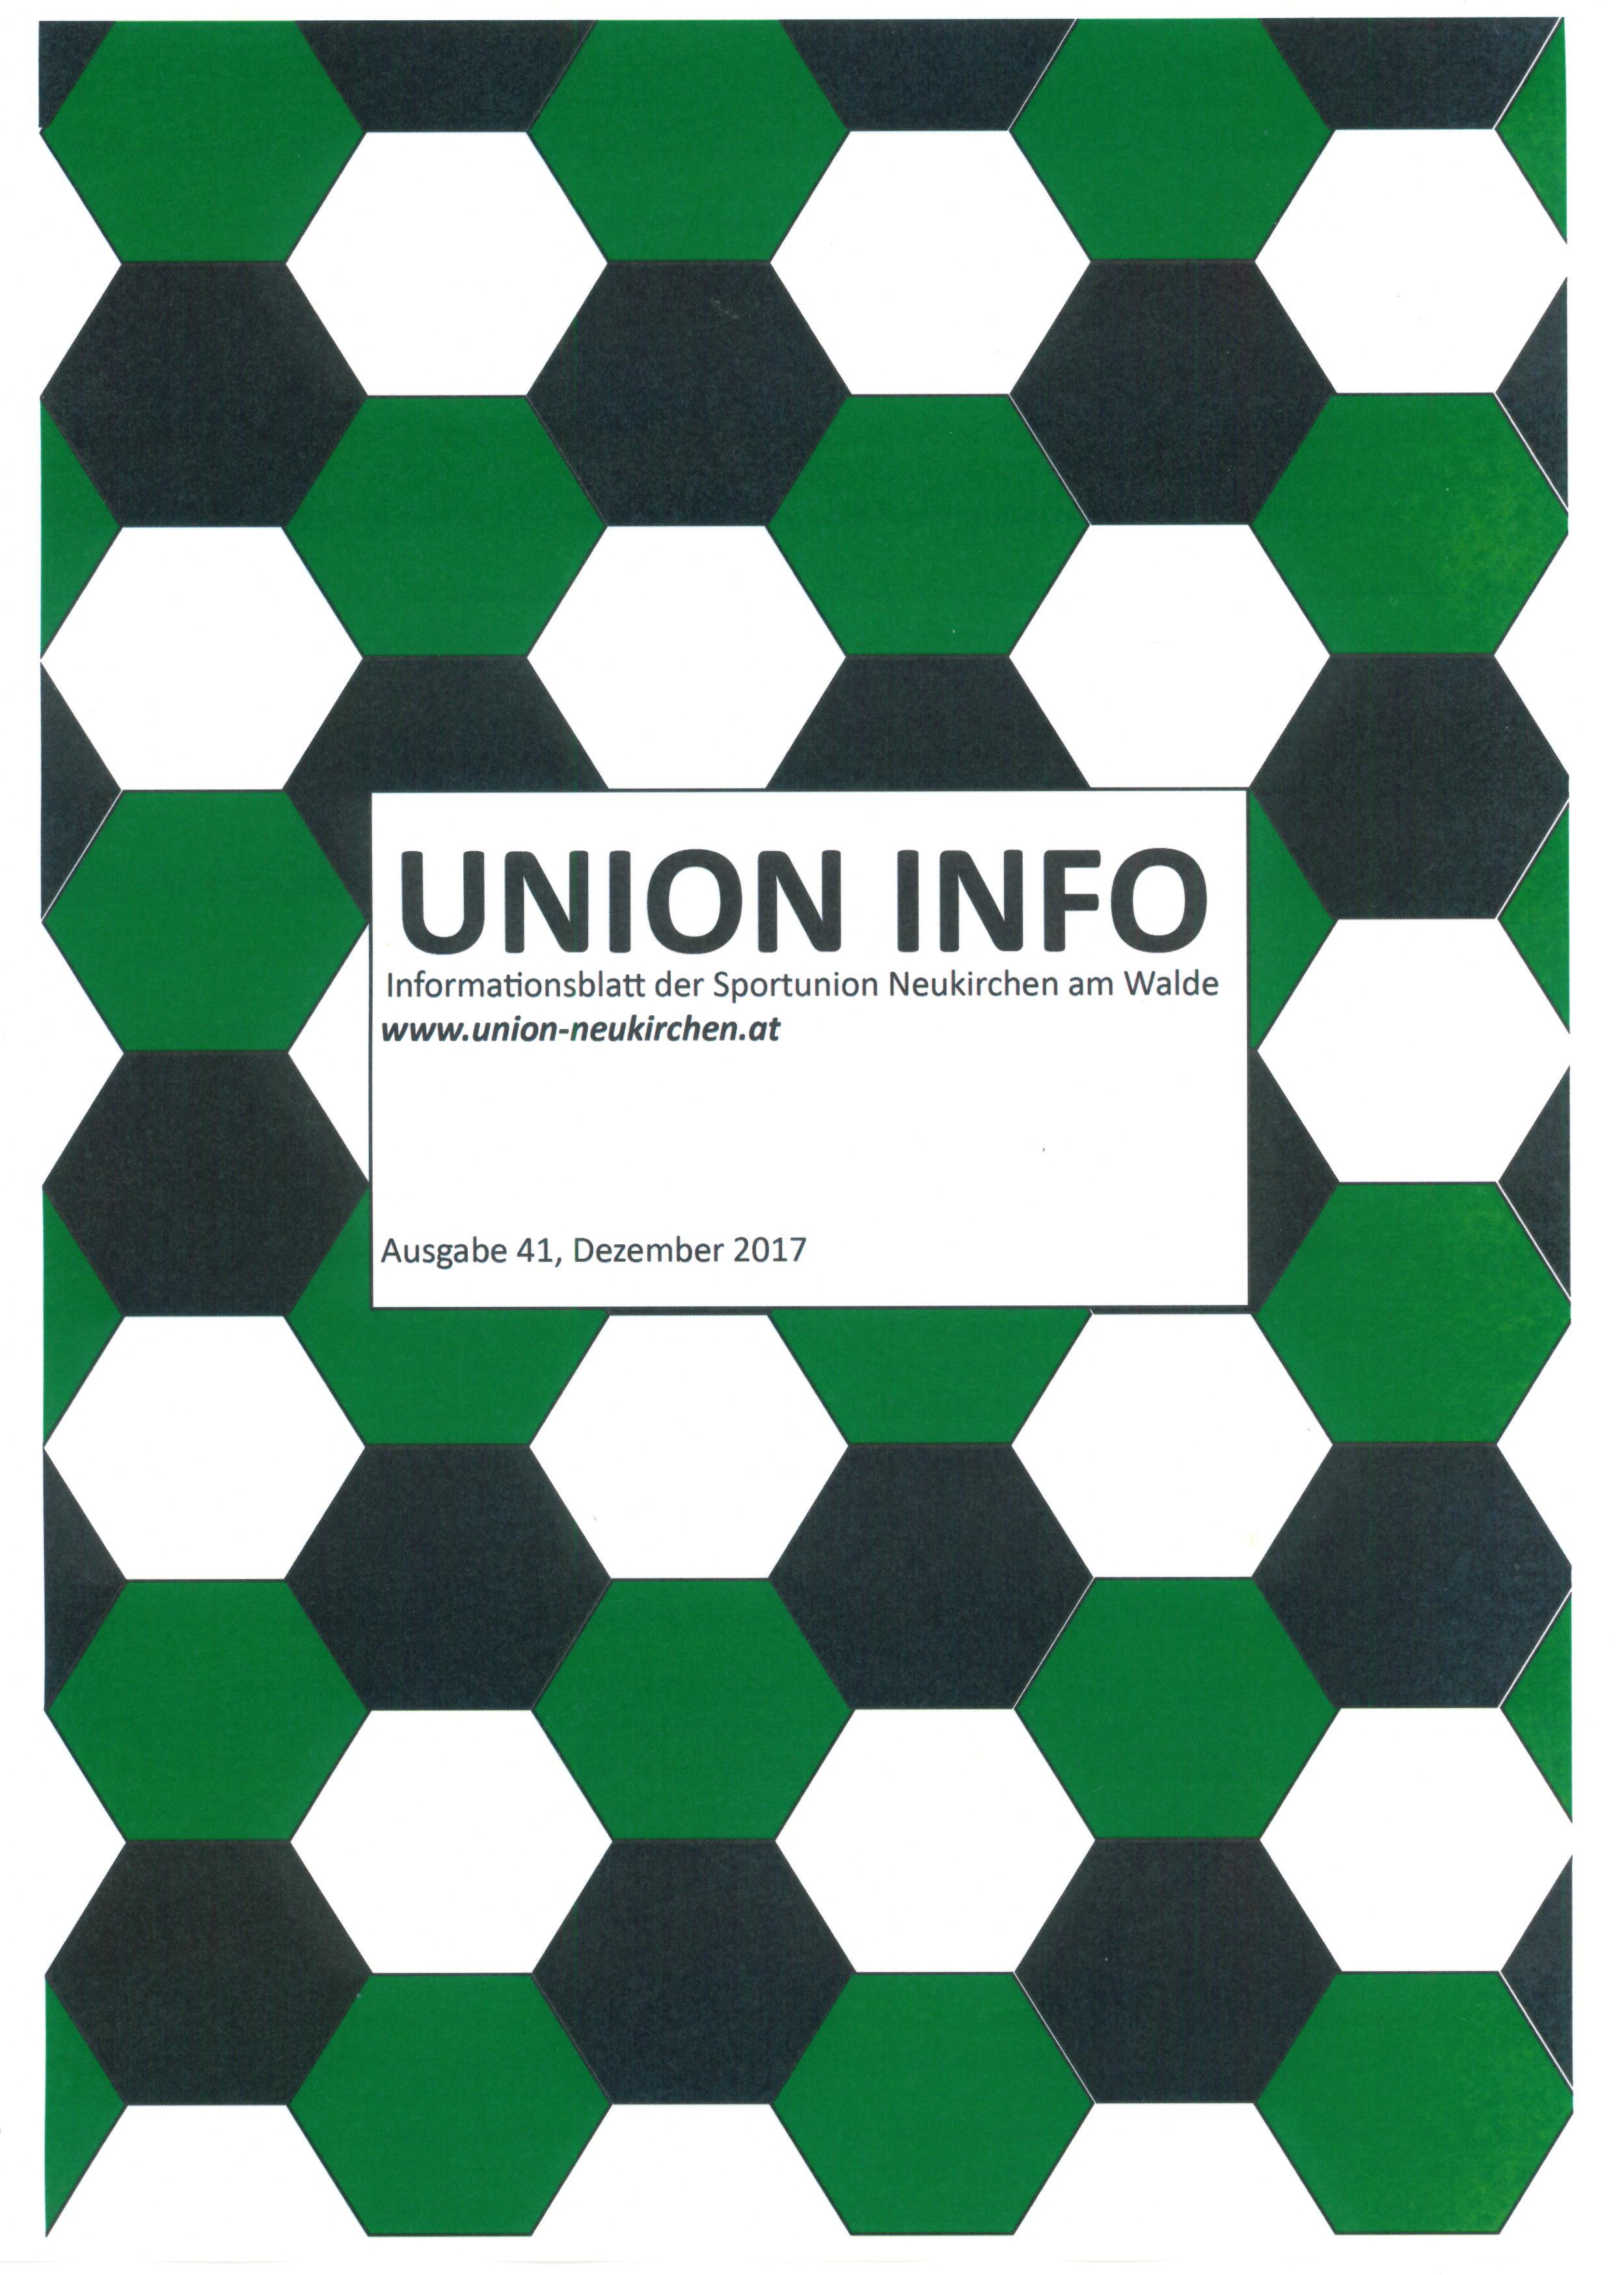 Union Info 2017